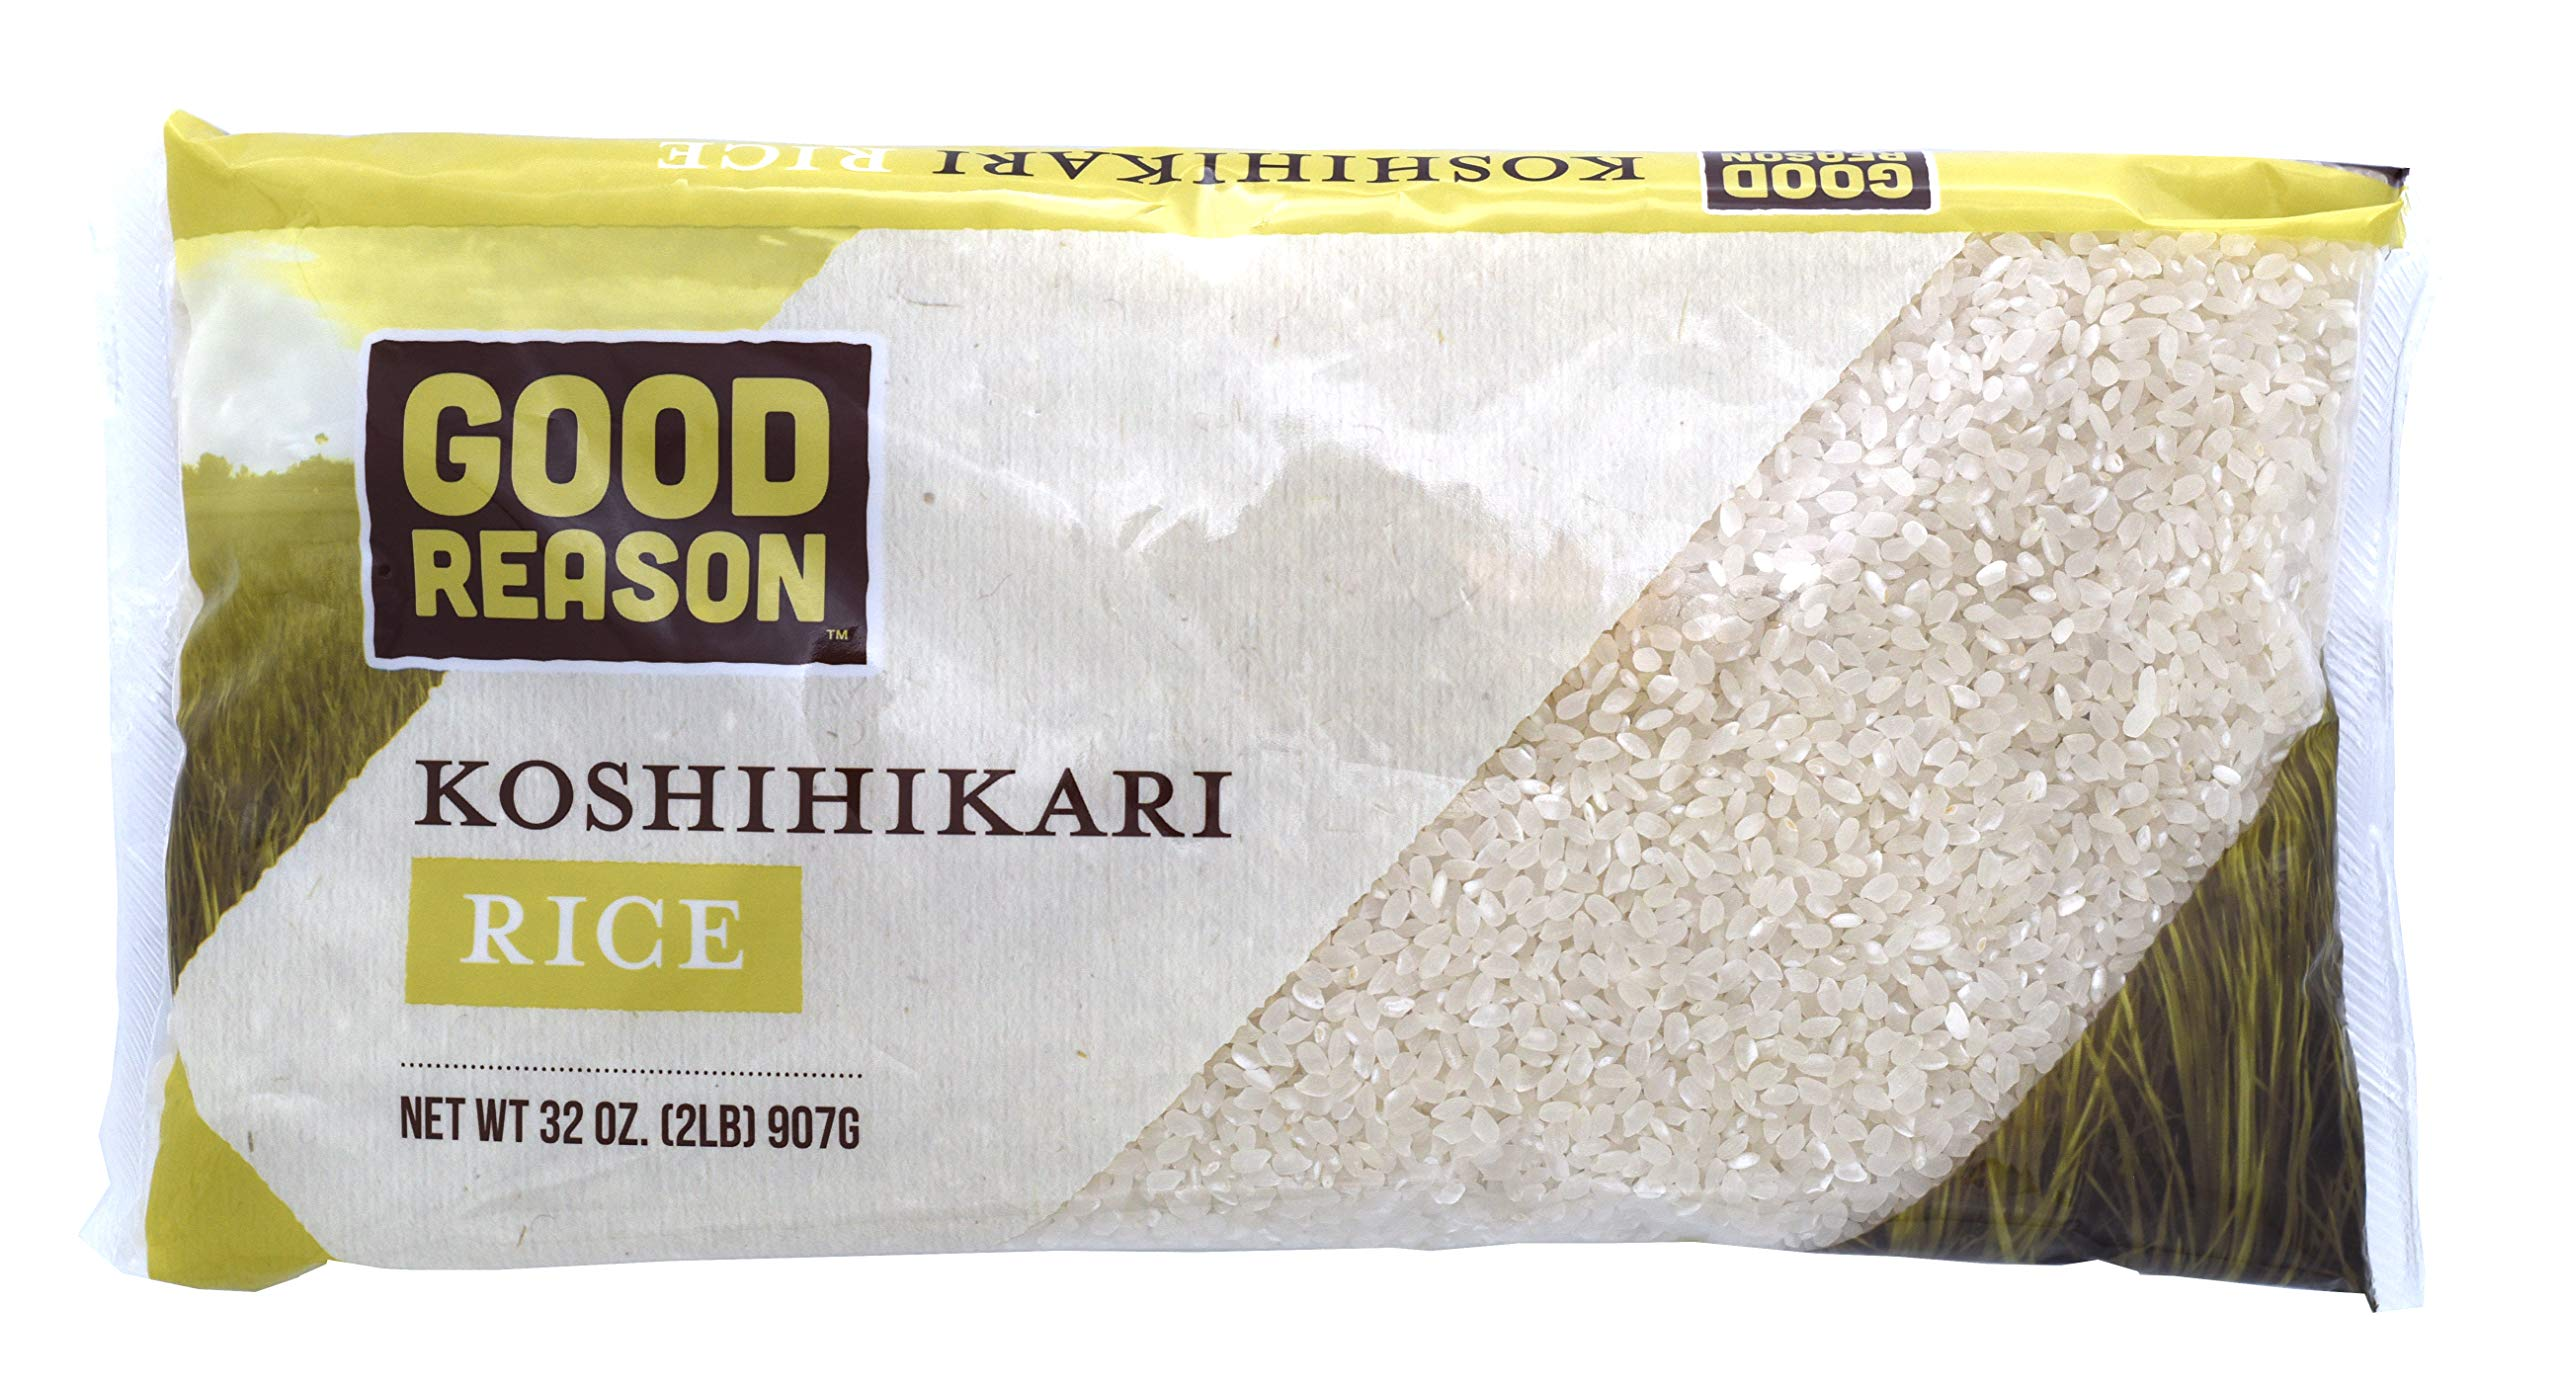 Good Reason Rice Koshihikari Rice, 2 Lb